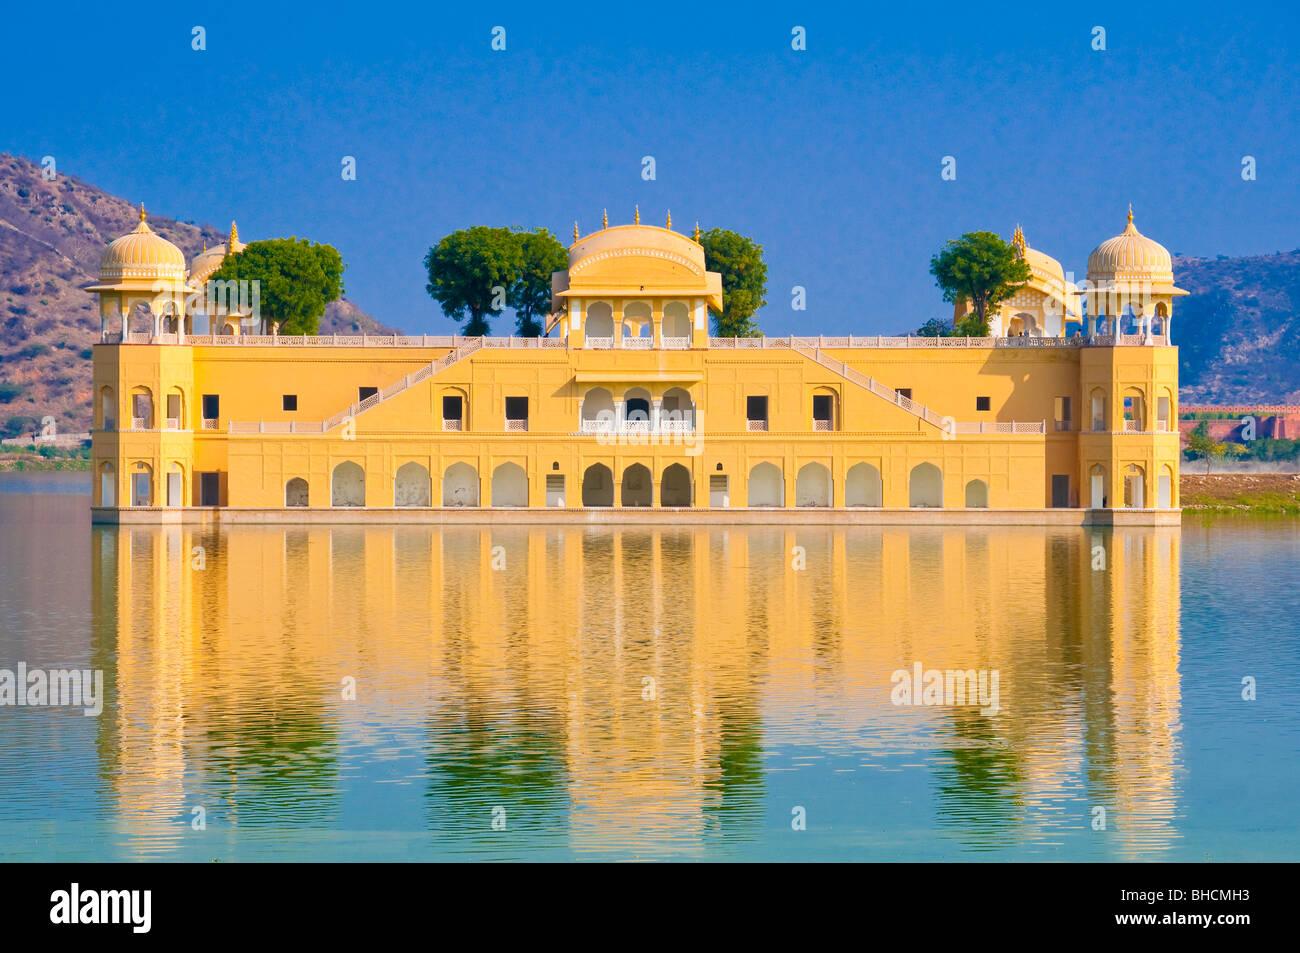 The Jai Mahal - Lake Palace, Jaipur, Rajasthan, India - Stock Image